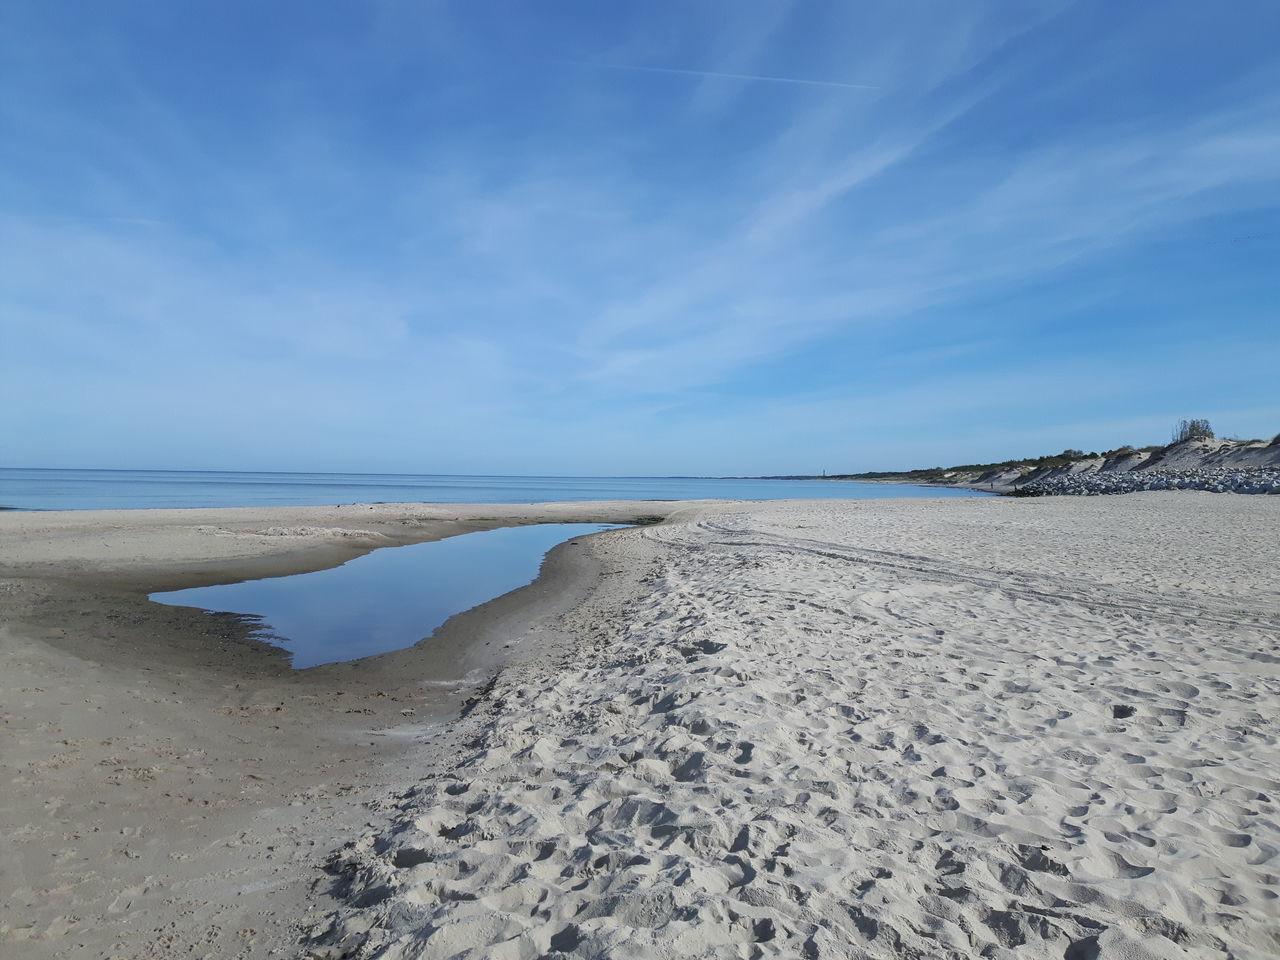 Lazurowe wybrzeże nad Bałtykiem Beach Blue Sky Nature Beauty In Nature Cloud - Sky First Eyeem Photo